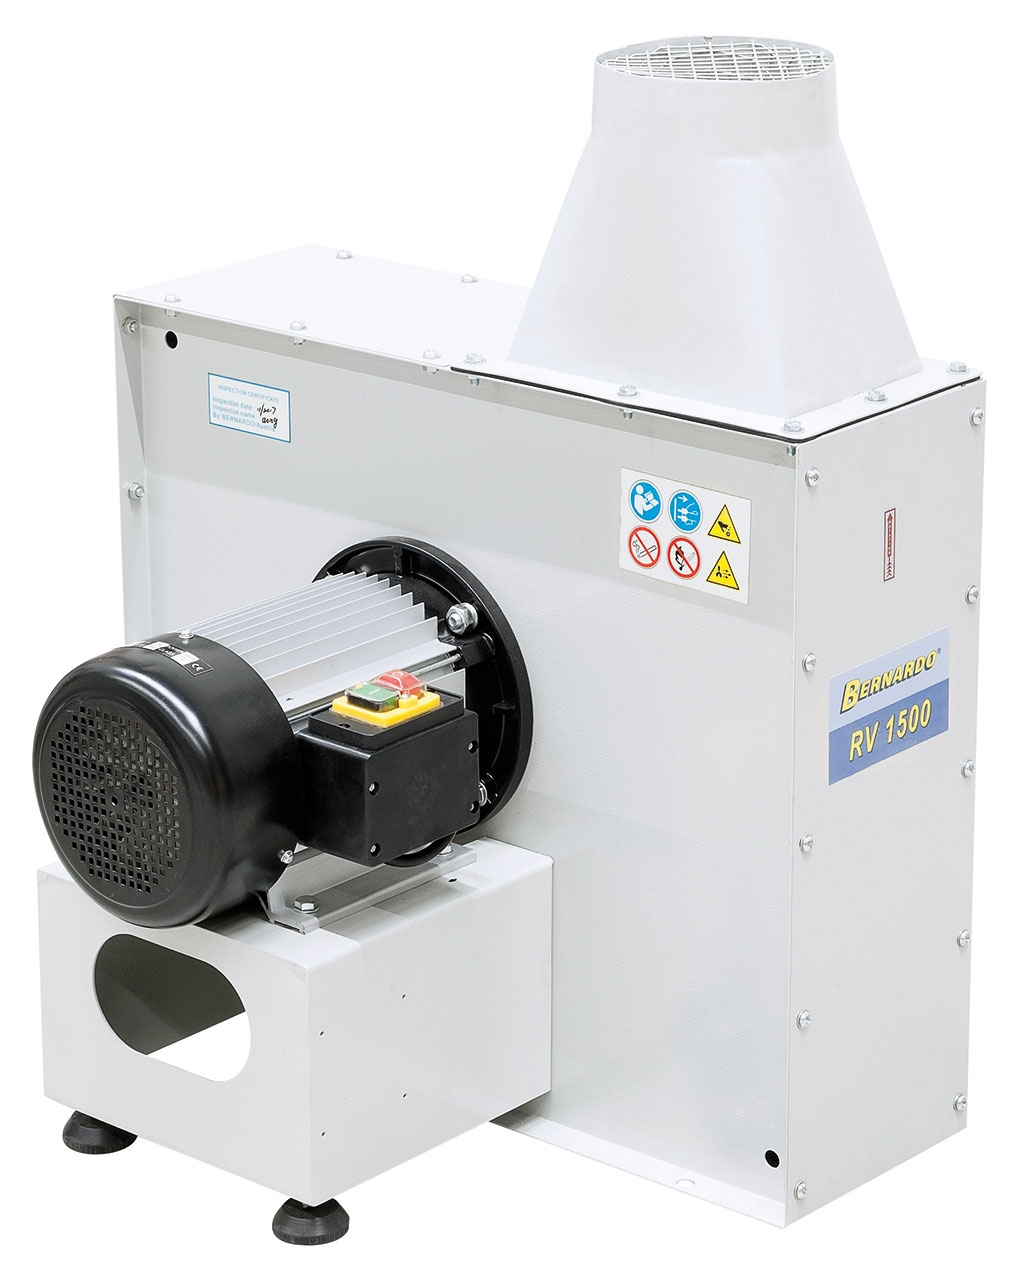 Wentylator promieniowy RV 1500 BERNARDO